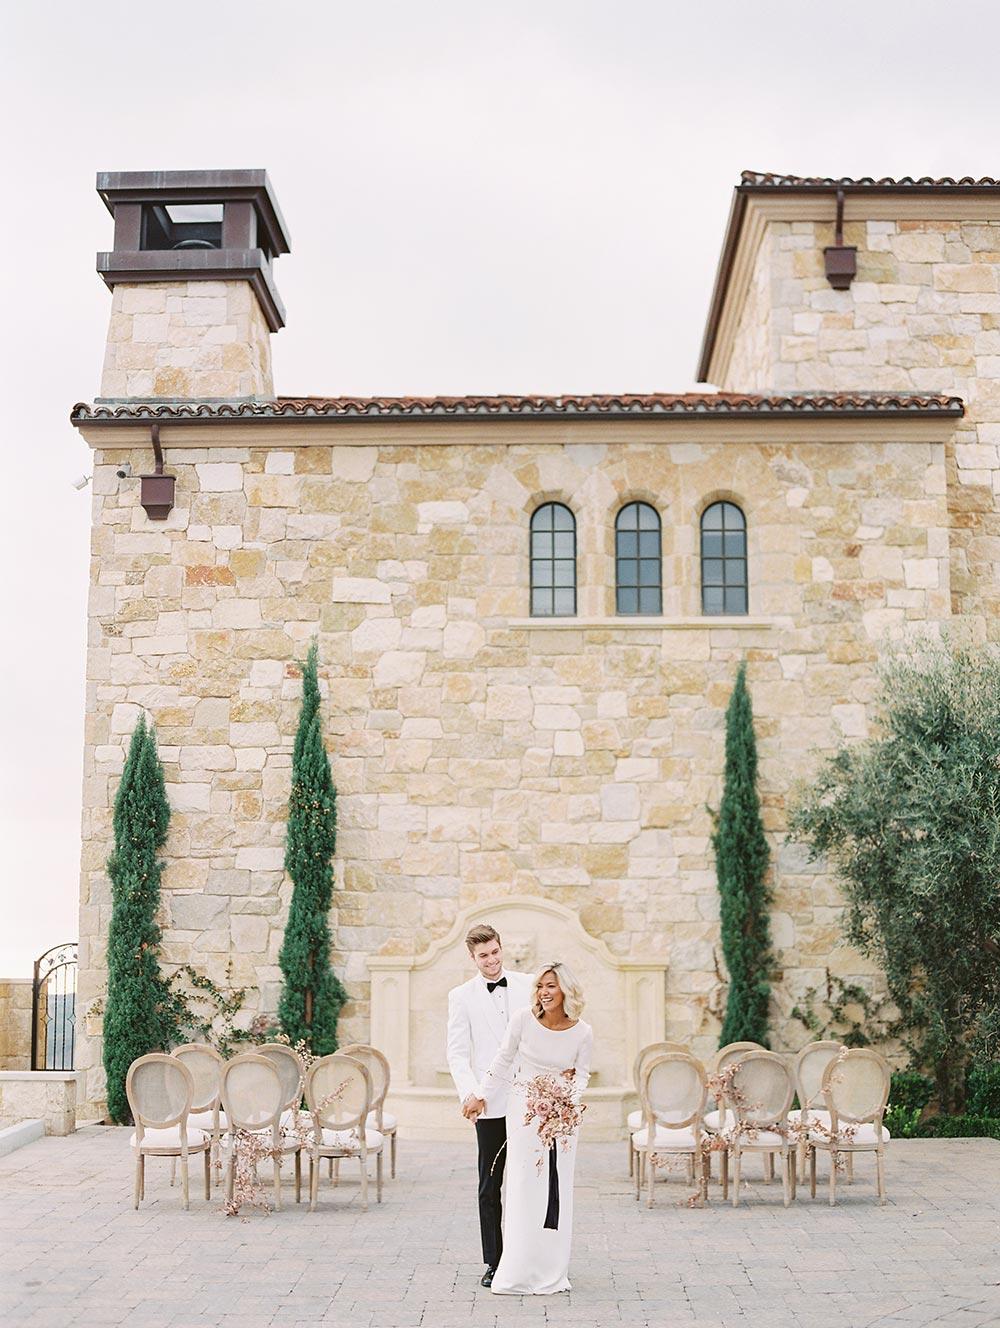 organic wedding ceremony with european vibes